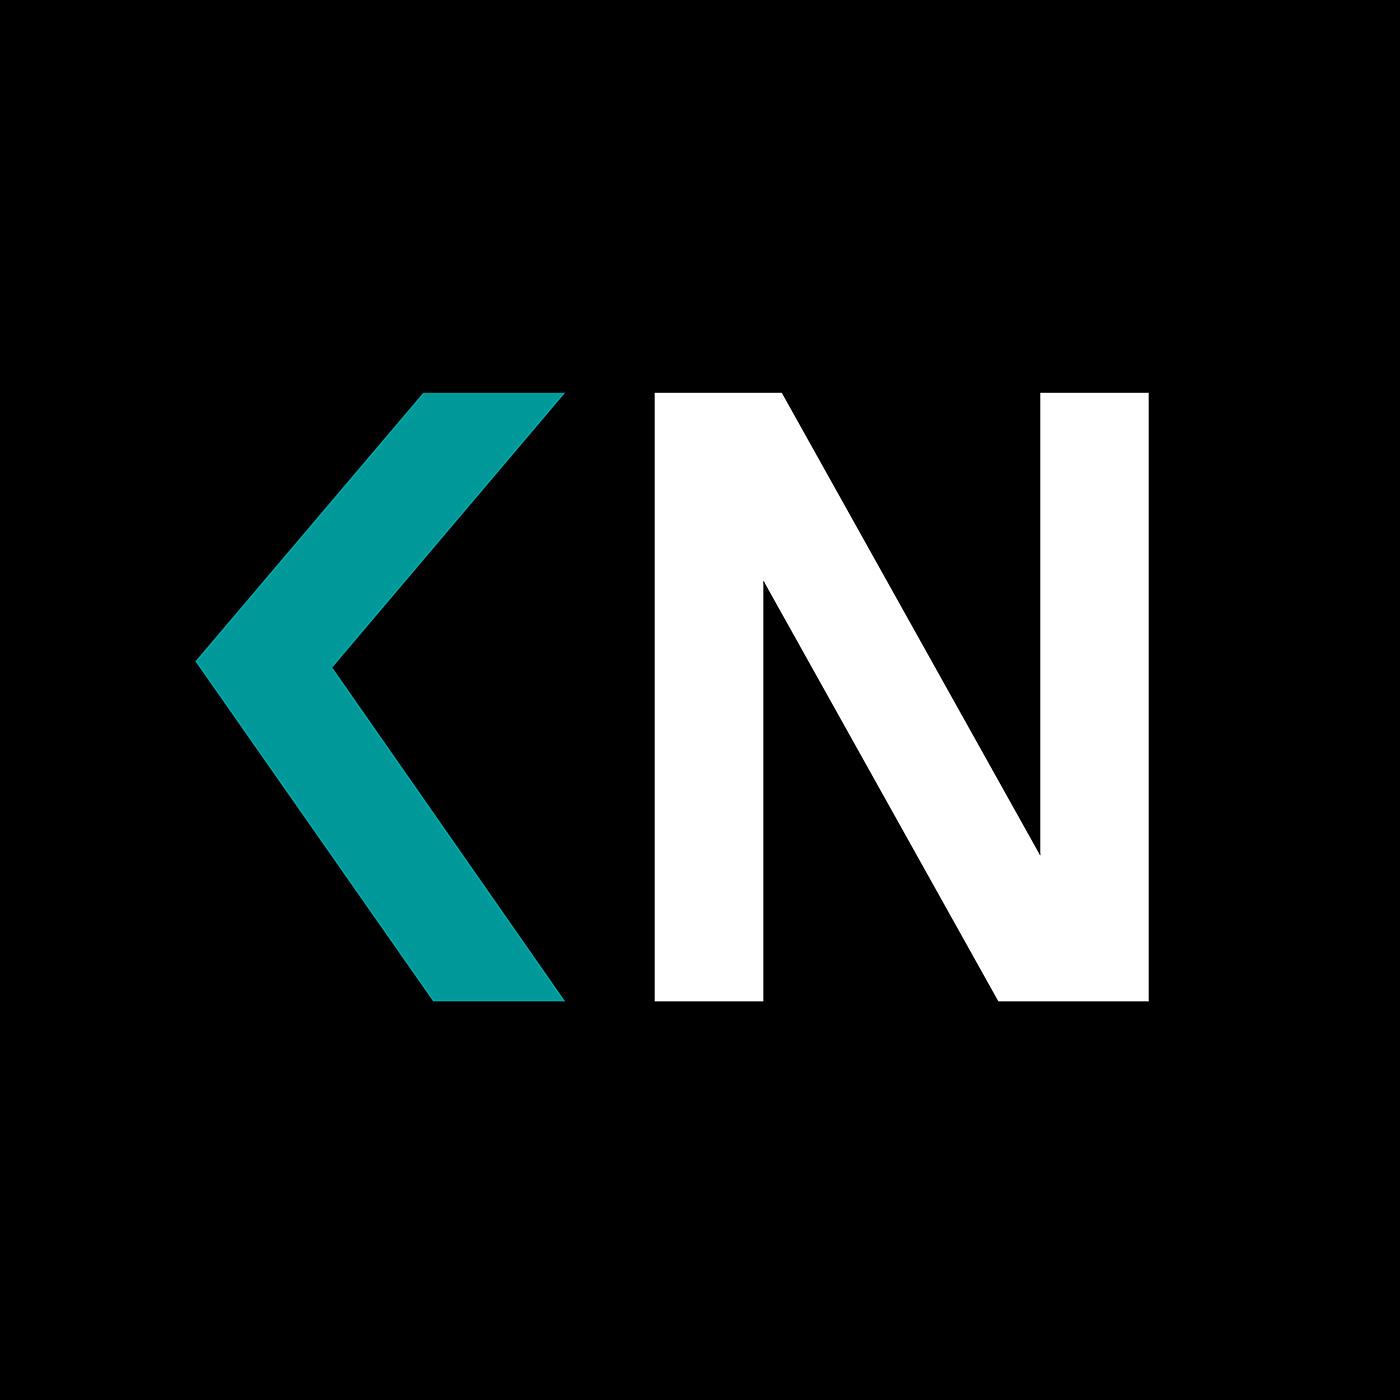 Episode 134: Caleborate from KINDA NEAT on RadioPublic